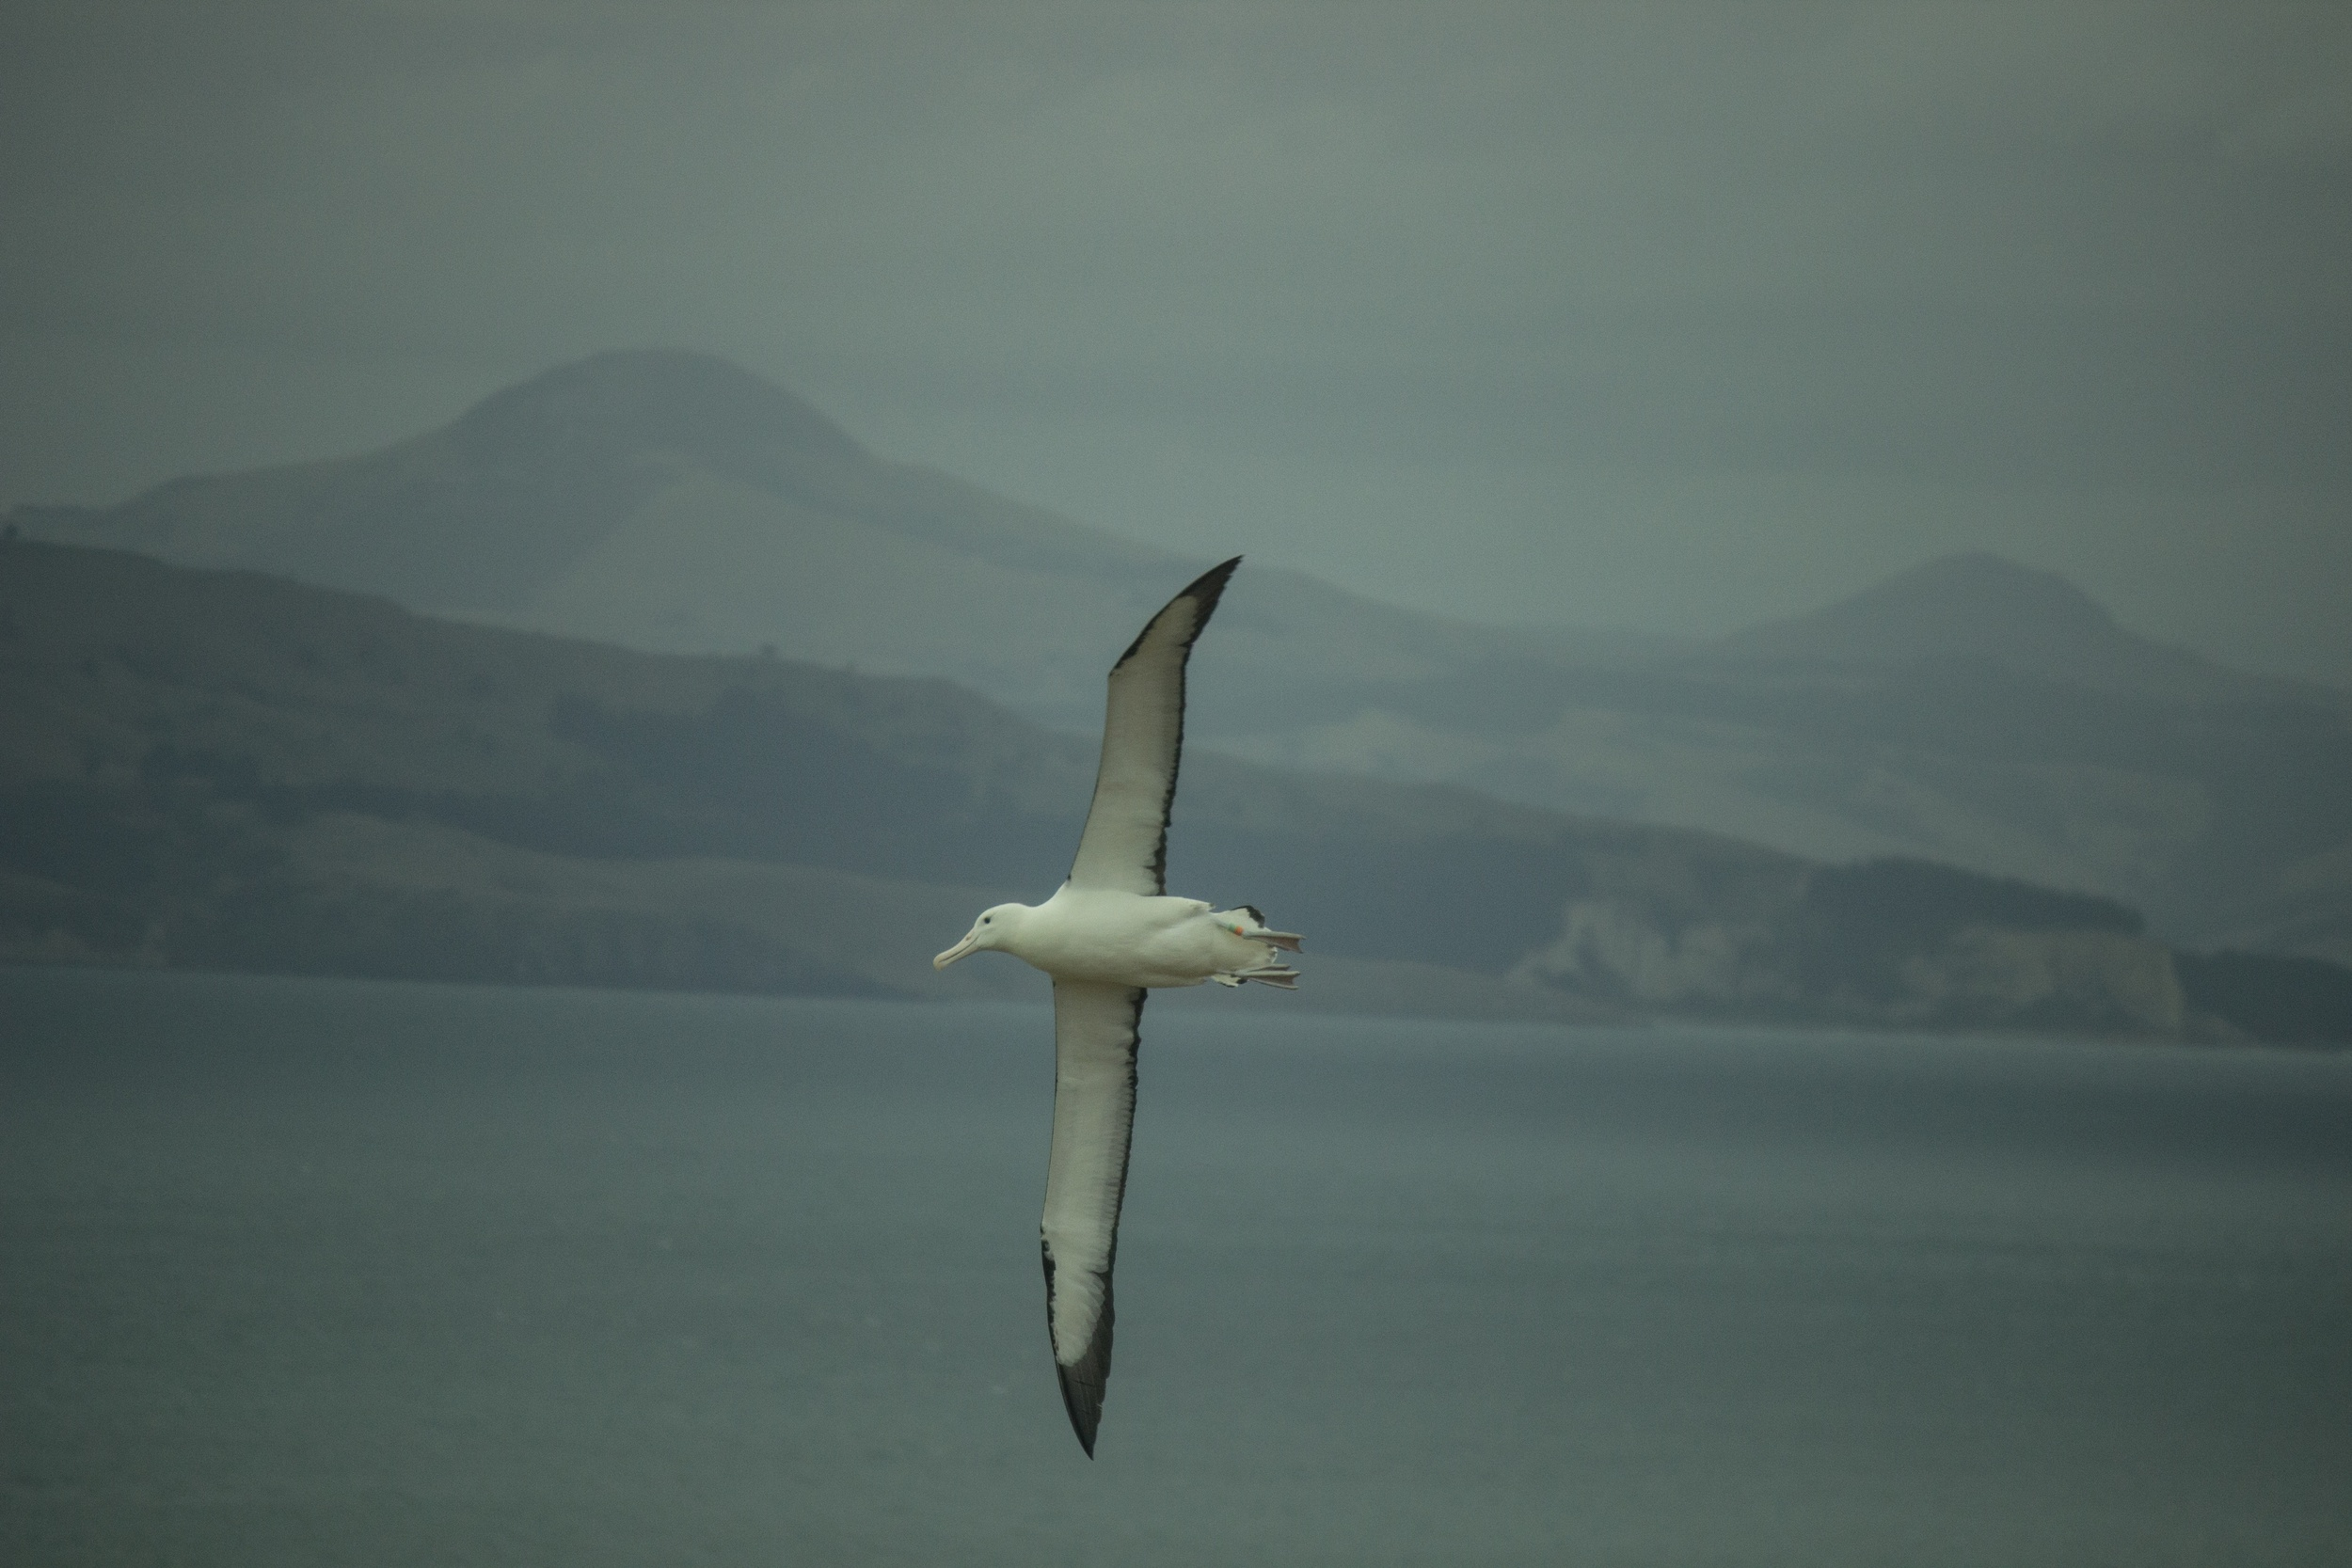 Northern Royal Albatross. Taiaroa Head, Dunedin, New Zealand.